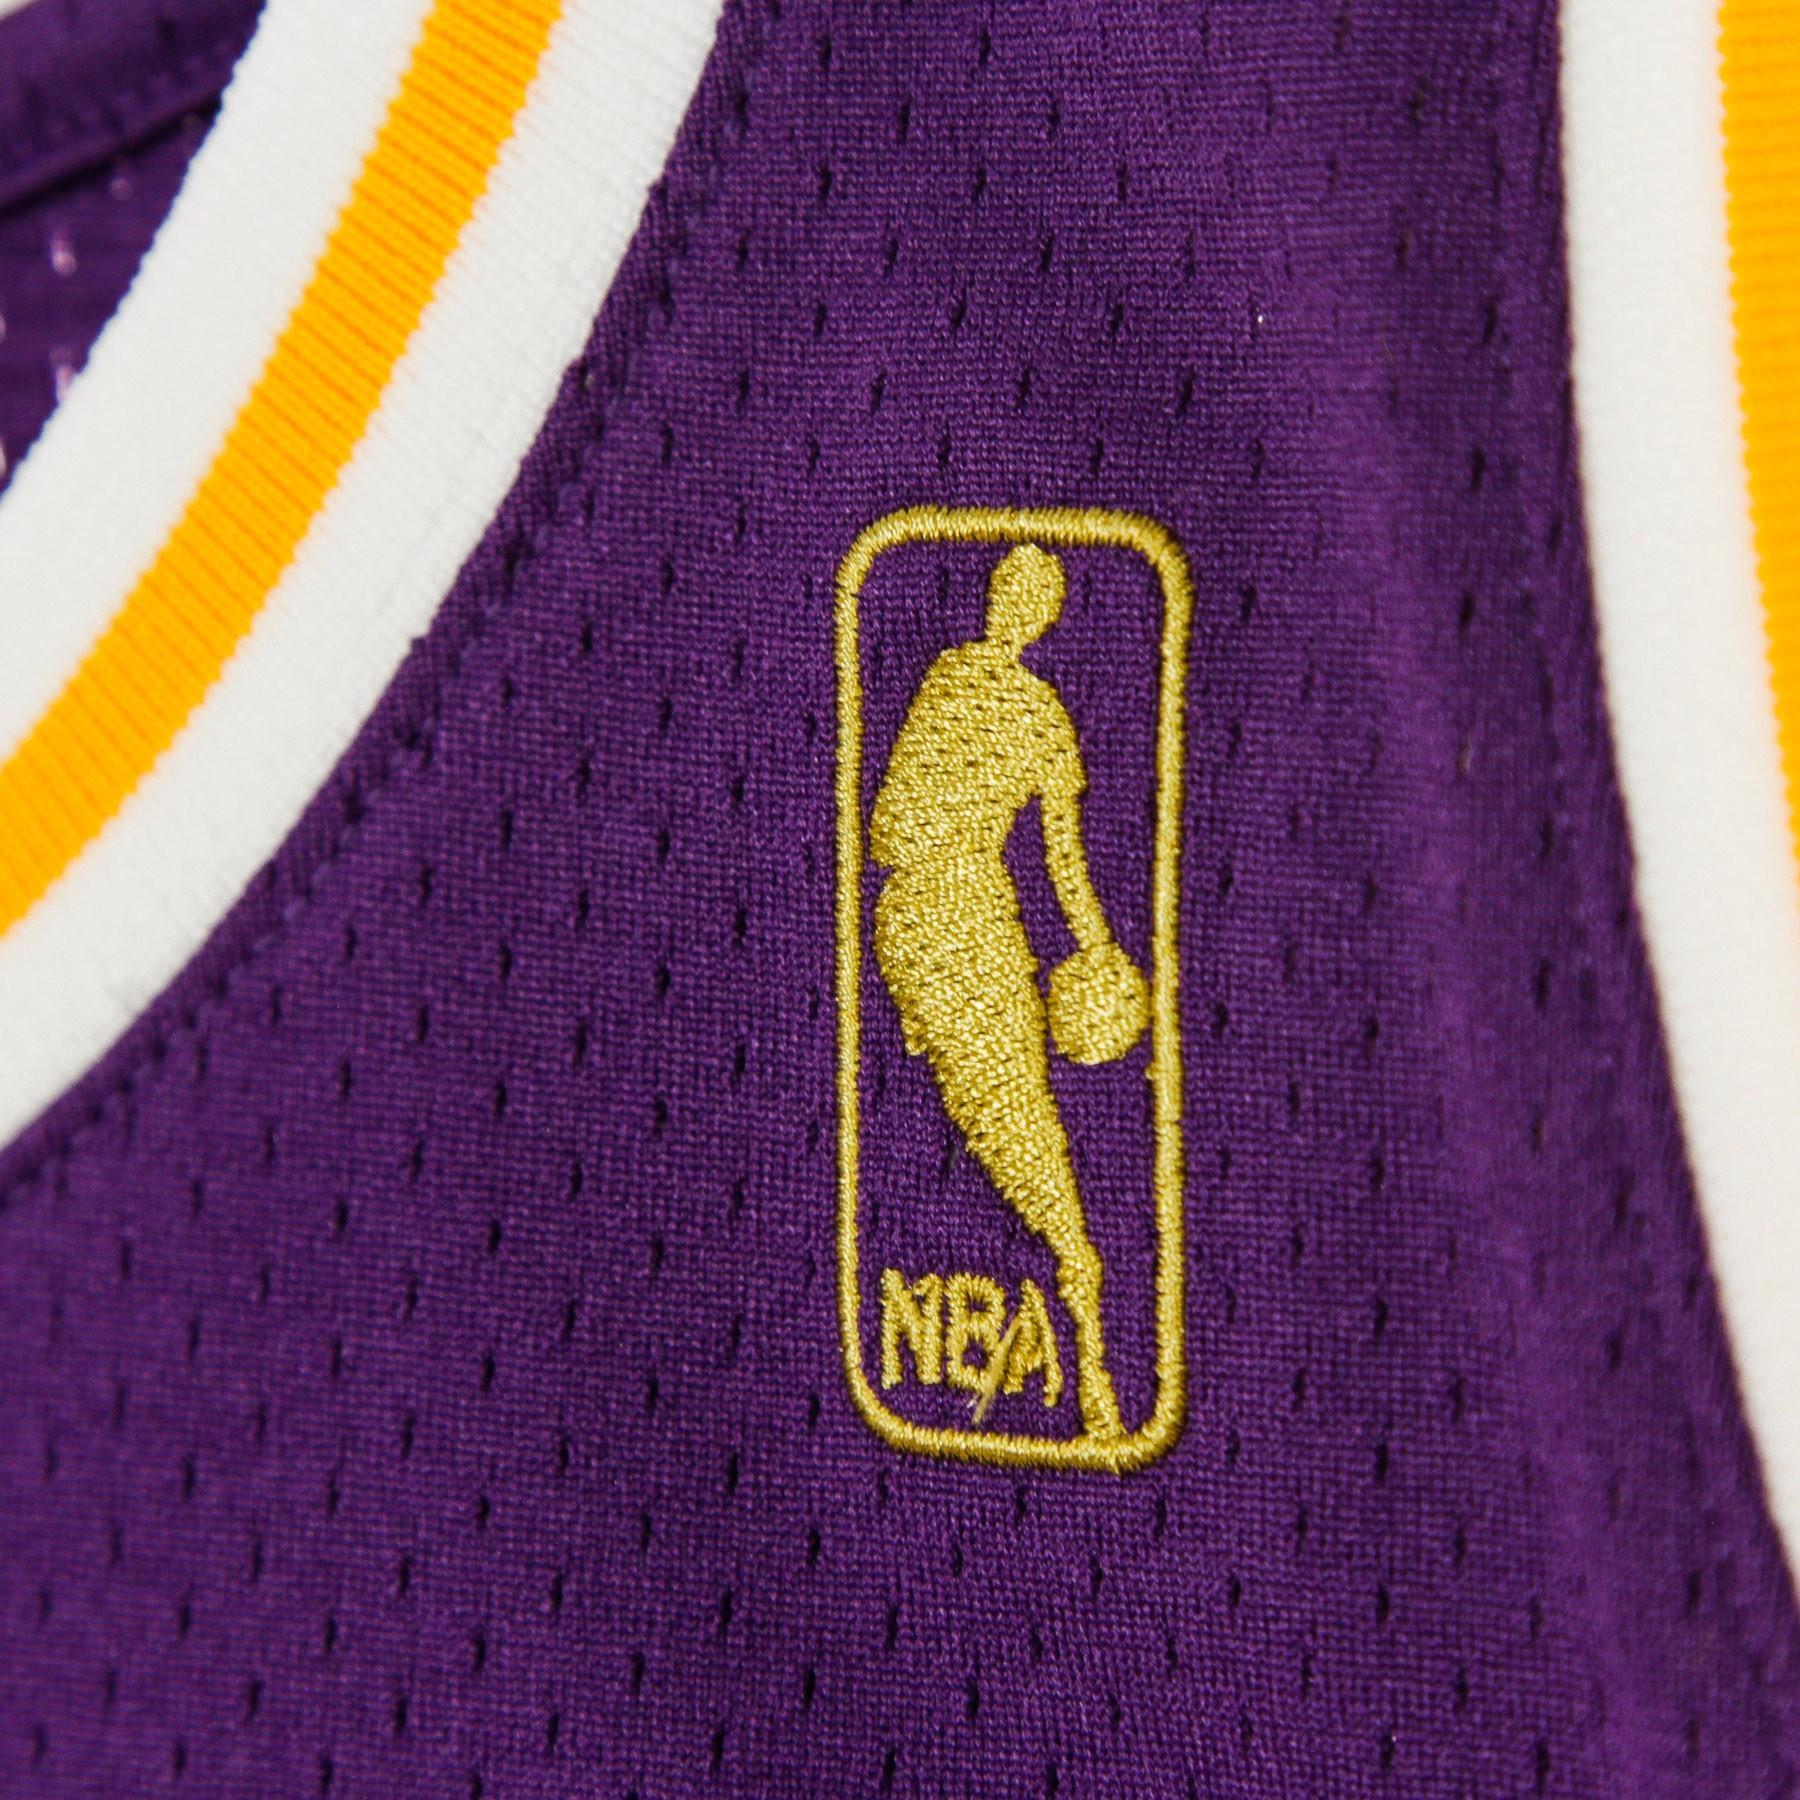 CANOTTA BASKET NBA AUTHENTIC JERSEY HARDWOOD CLASSICS NO8 KOBE BRYANT 1996-97 LOSLAK ROAD